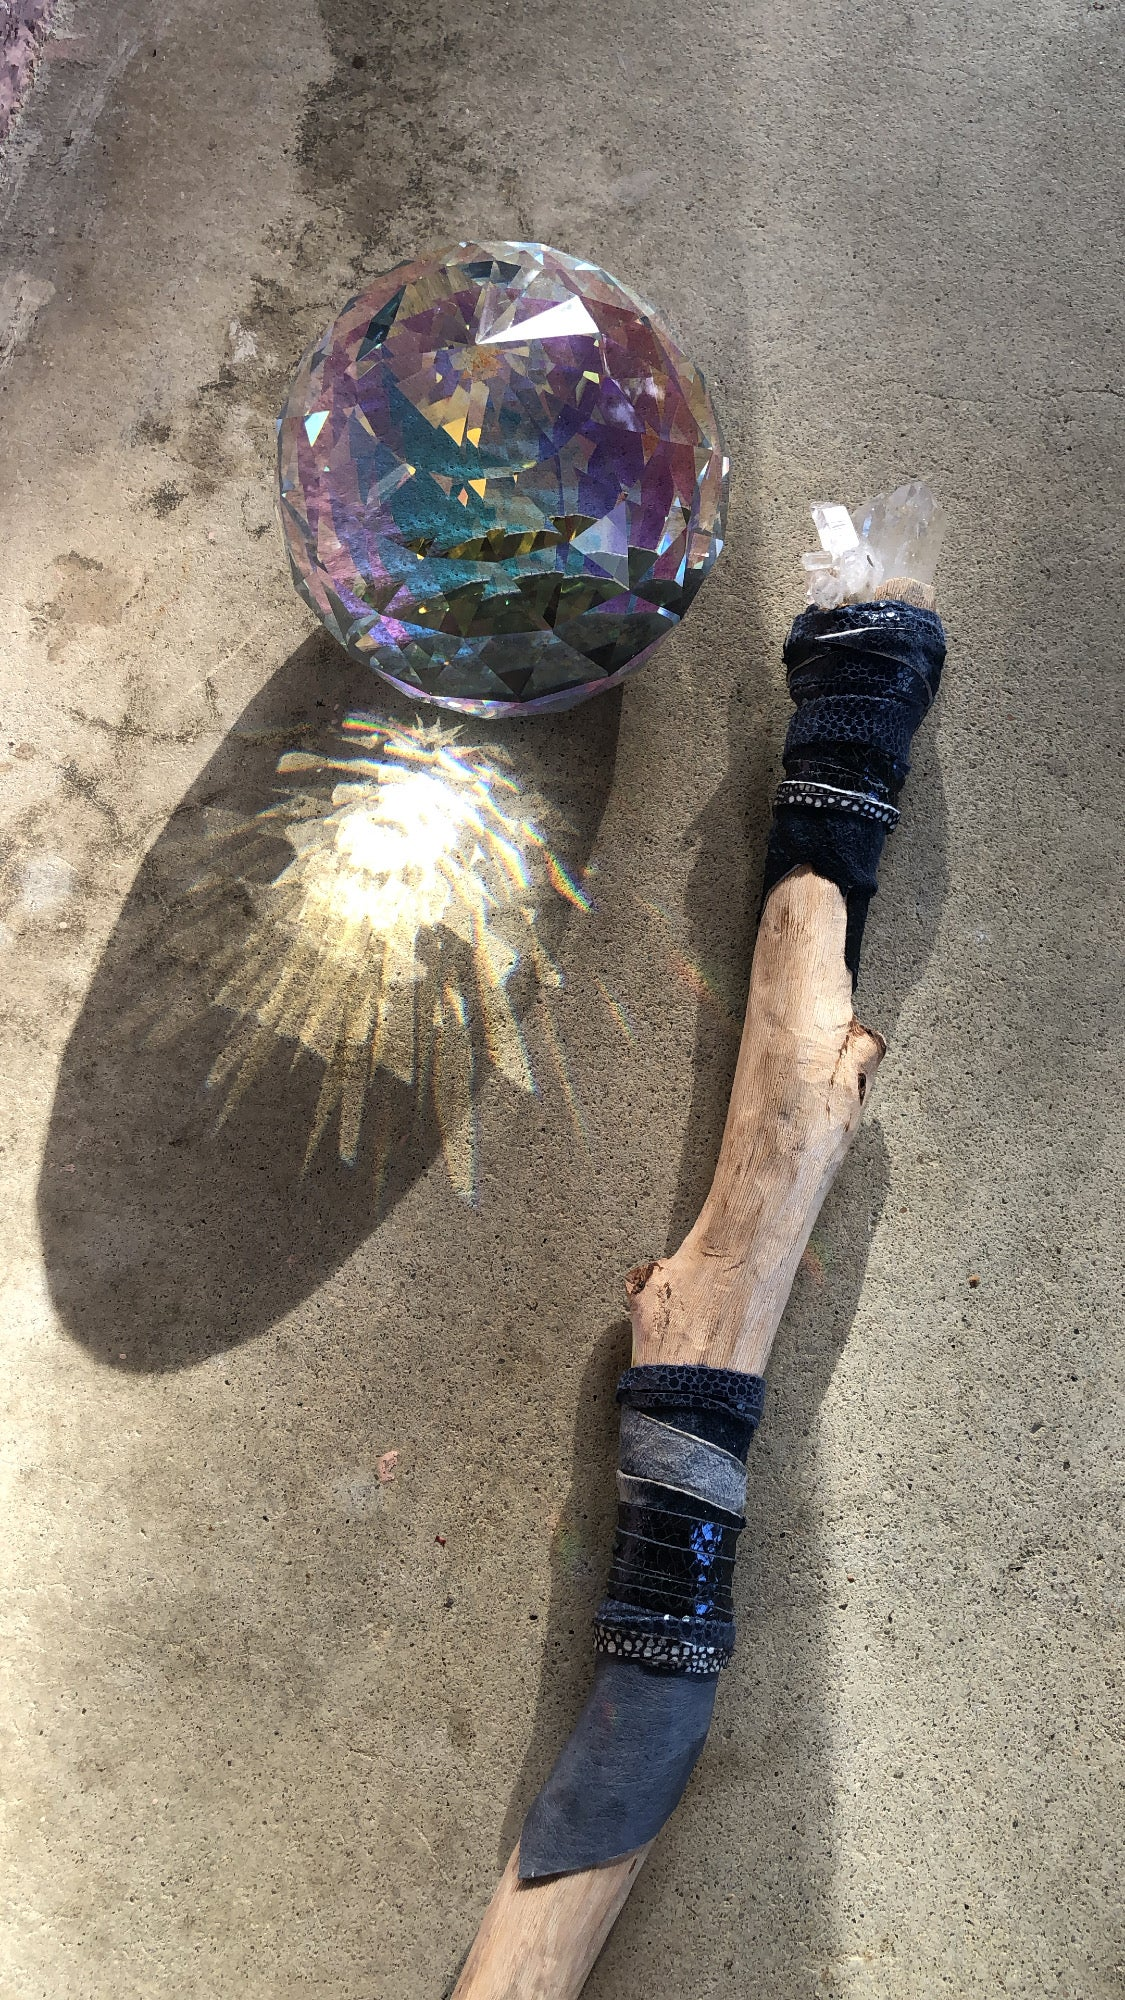 BLUE JEAN BBS magic wand